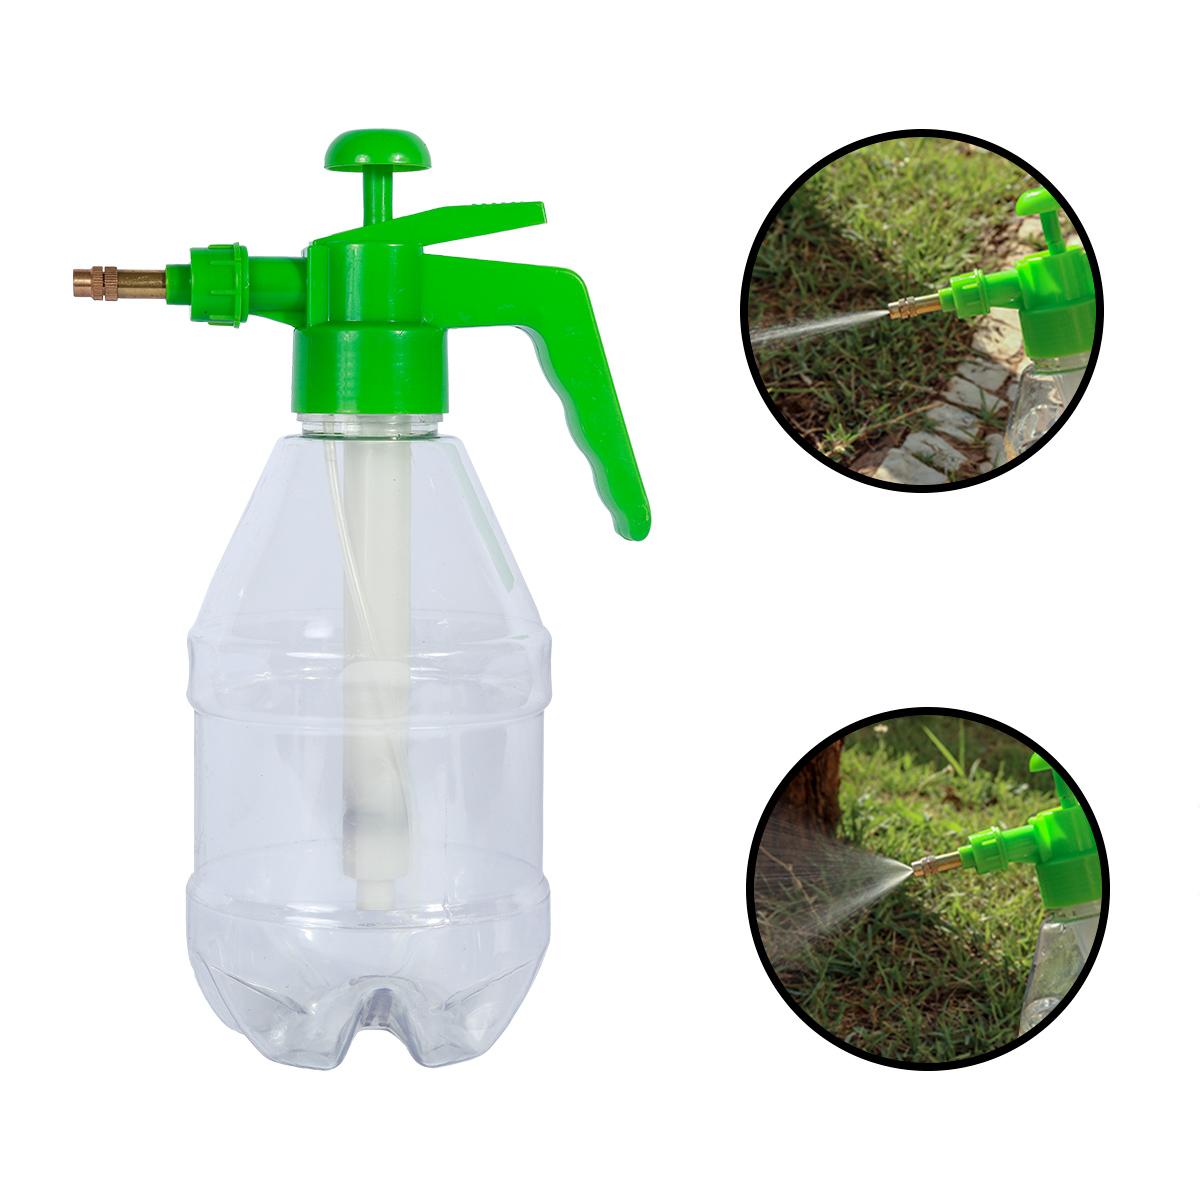 Kit Dux Defender Dul Germ H 5 Litros + Pulverizador de Pressão Acumulada 1,5 litros SuperAgri